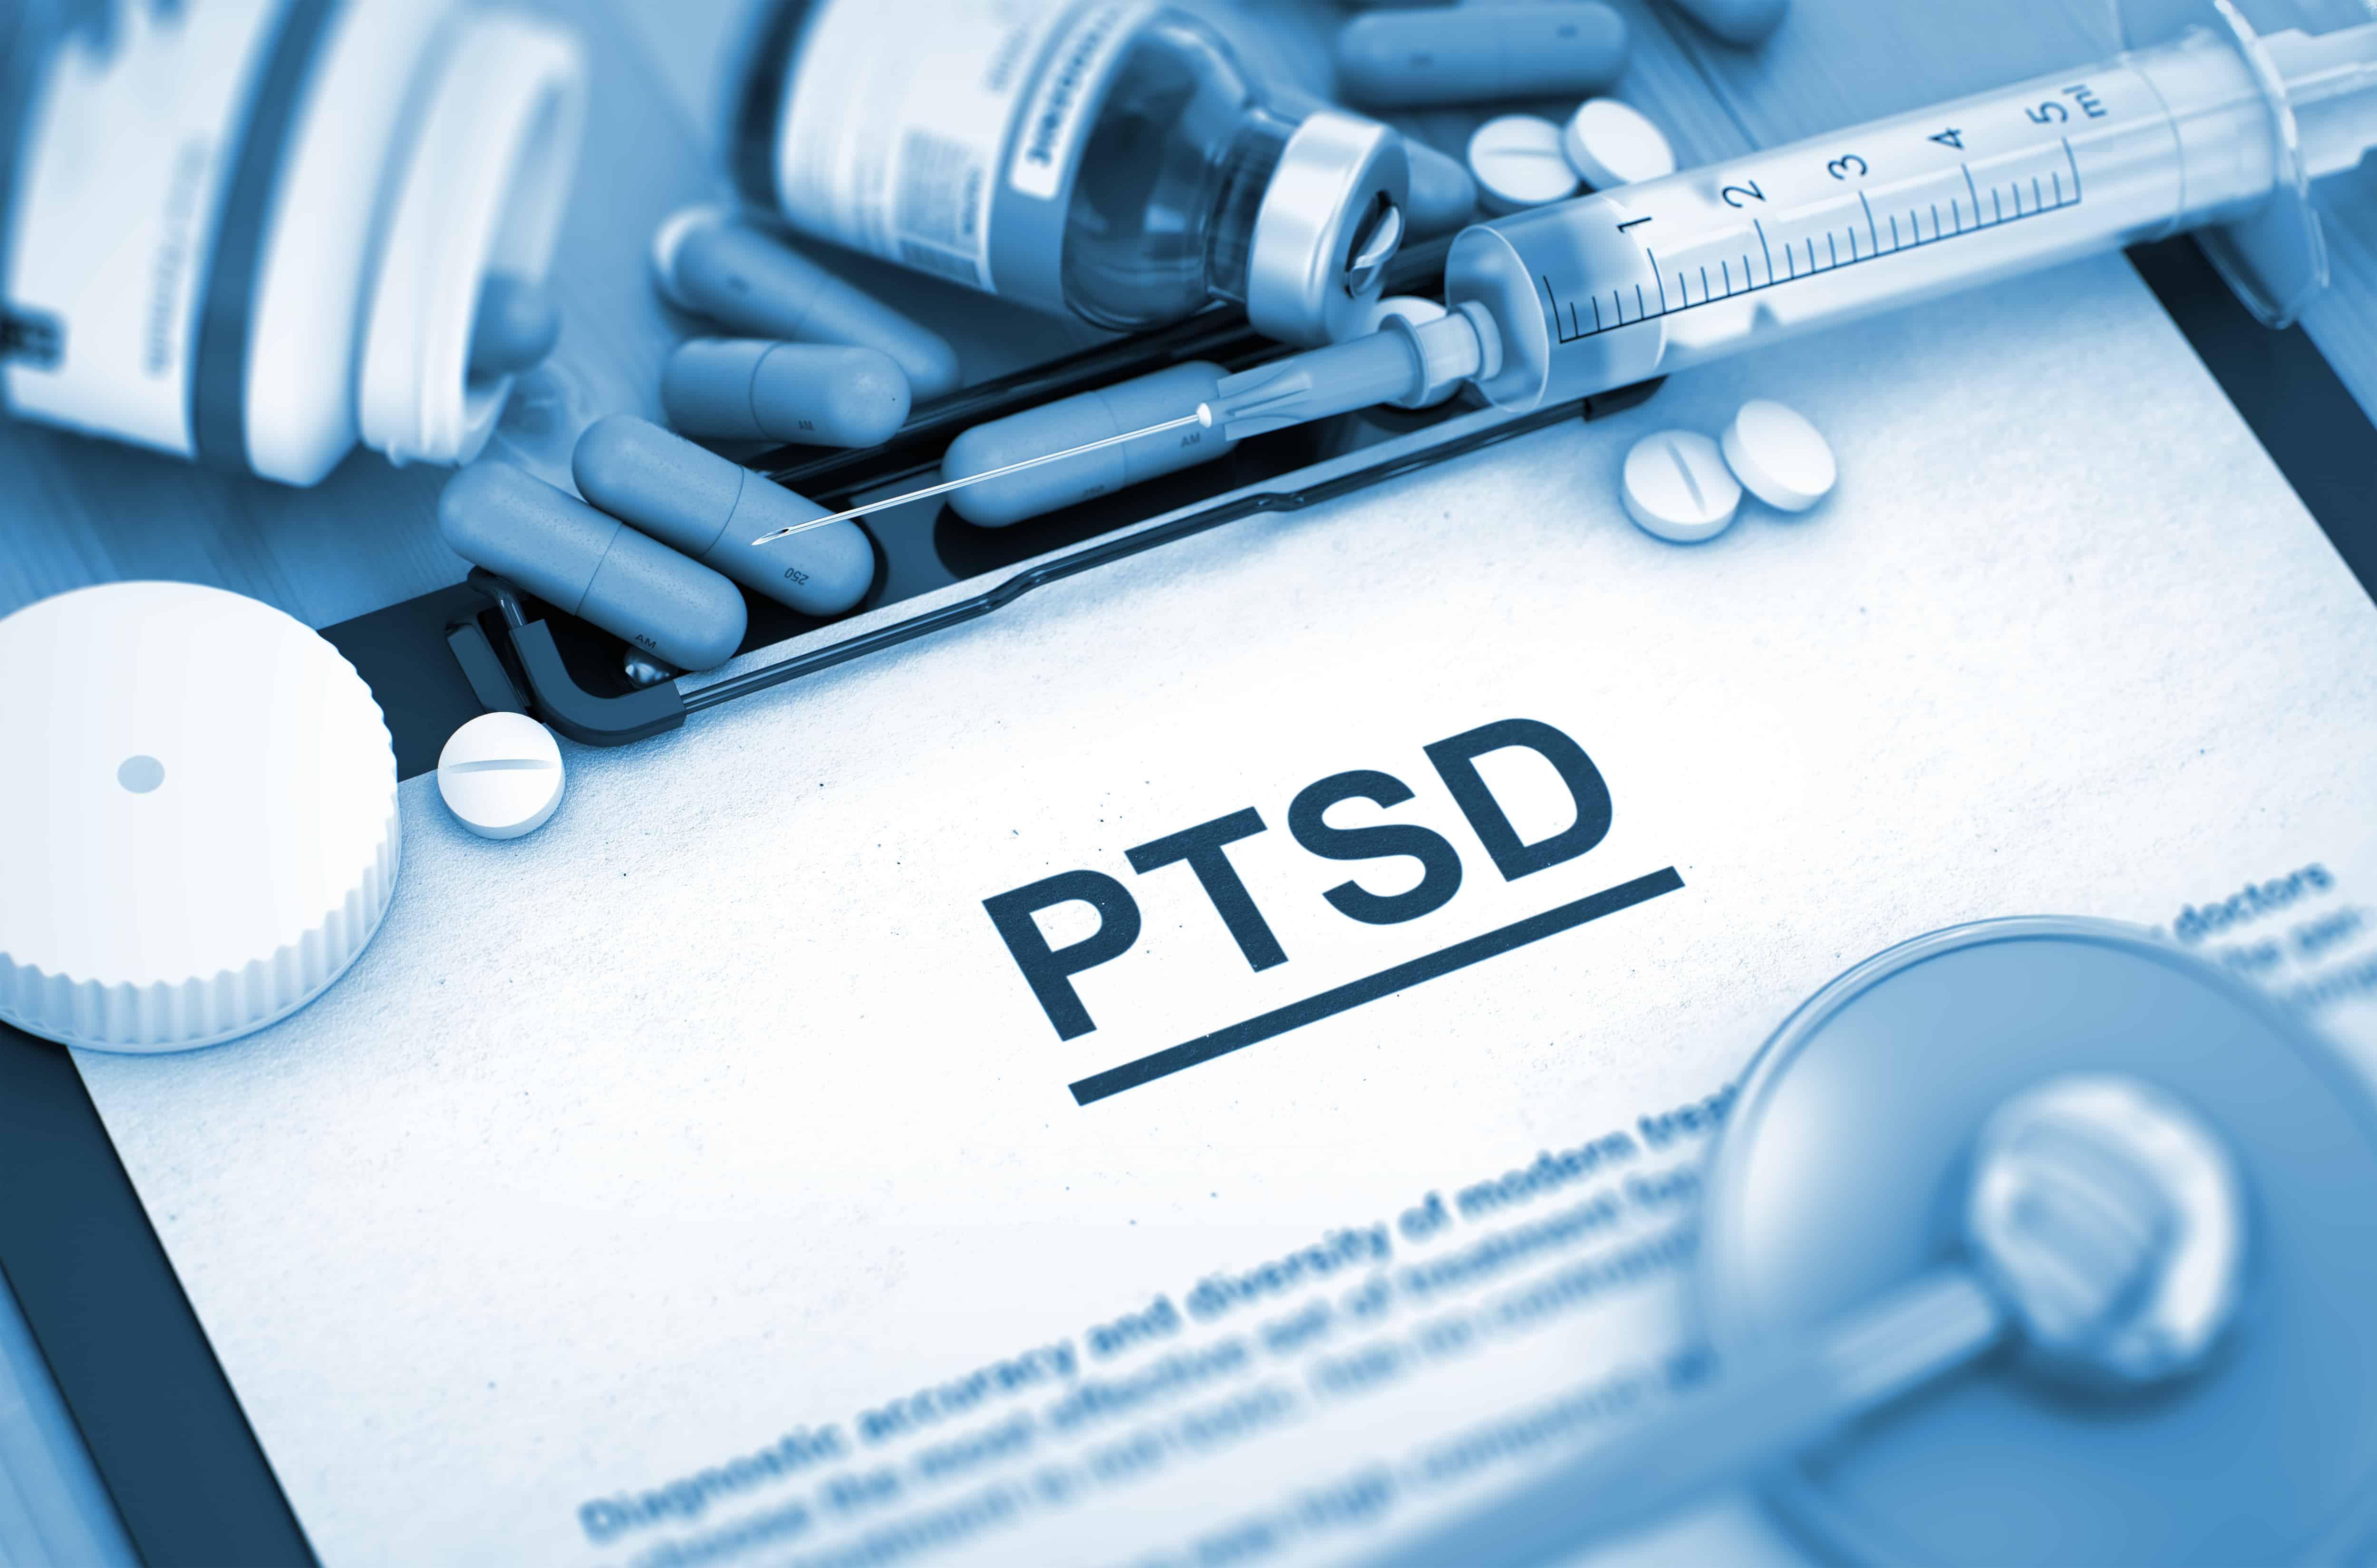 100 VA Disability for PTSD Explained 100 VA disability for PTSD